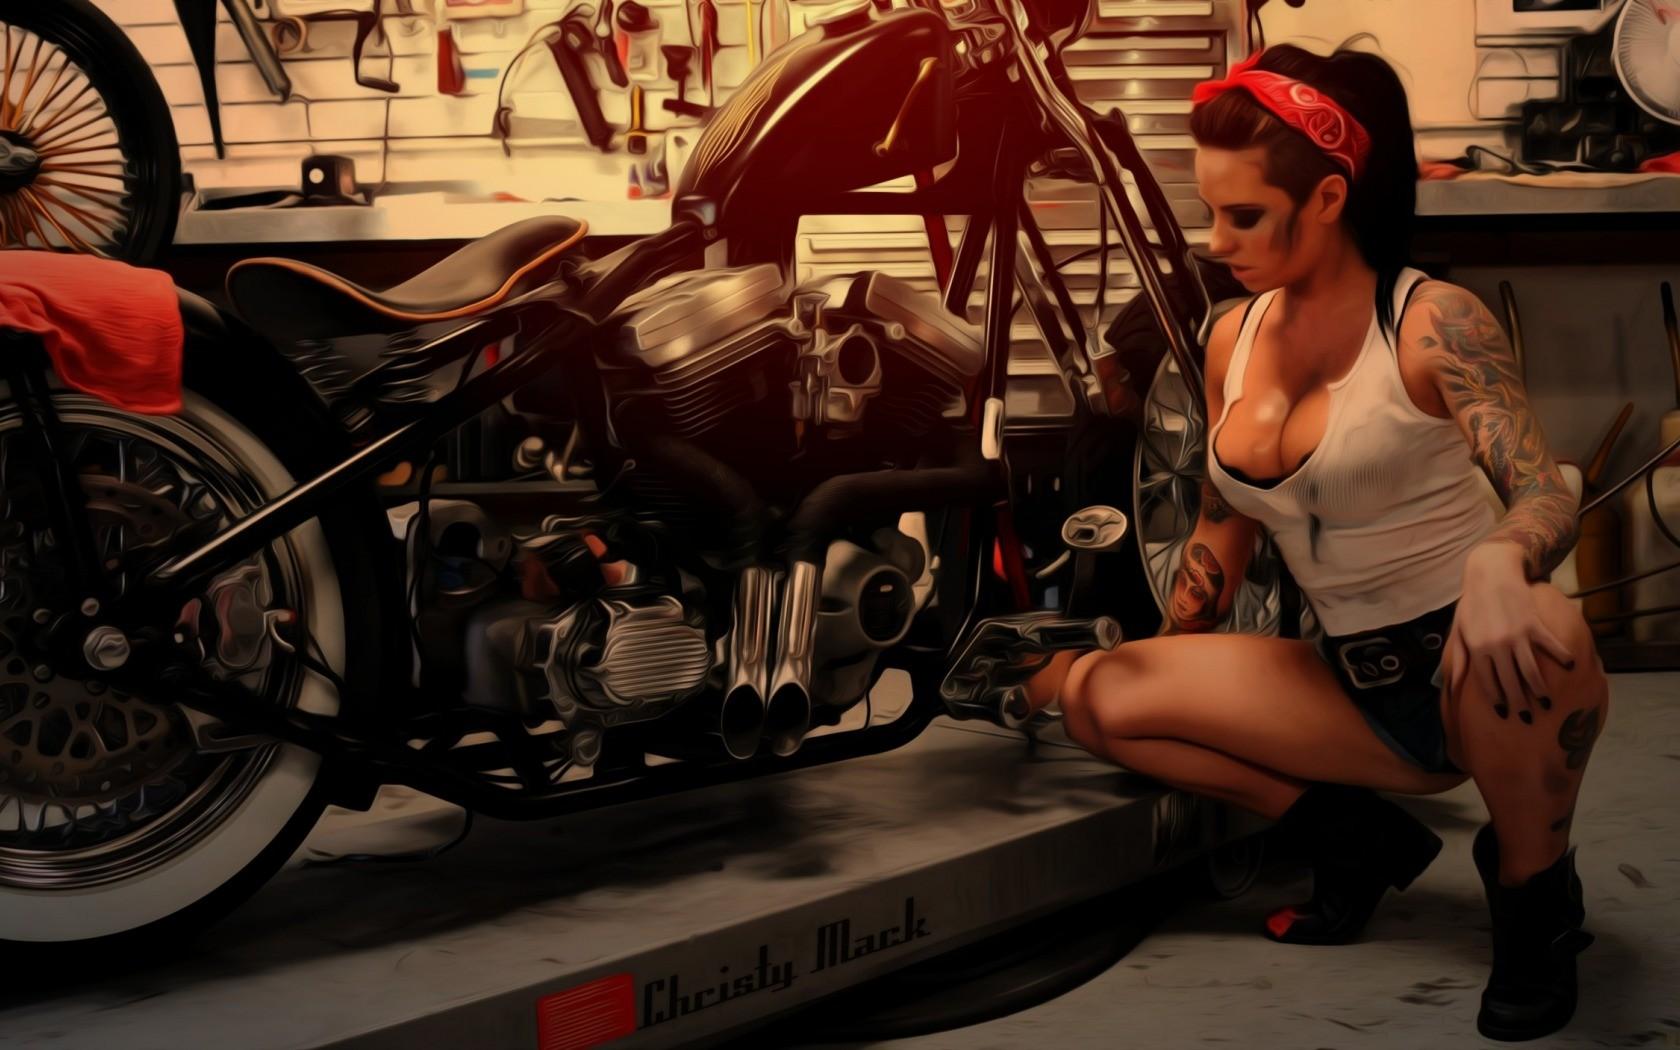 Star motorcycle sex porn